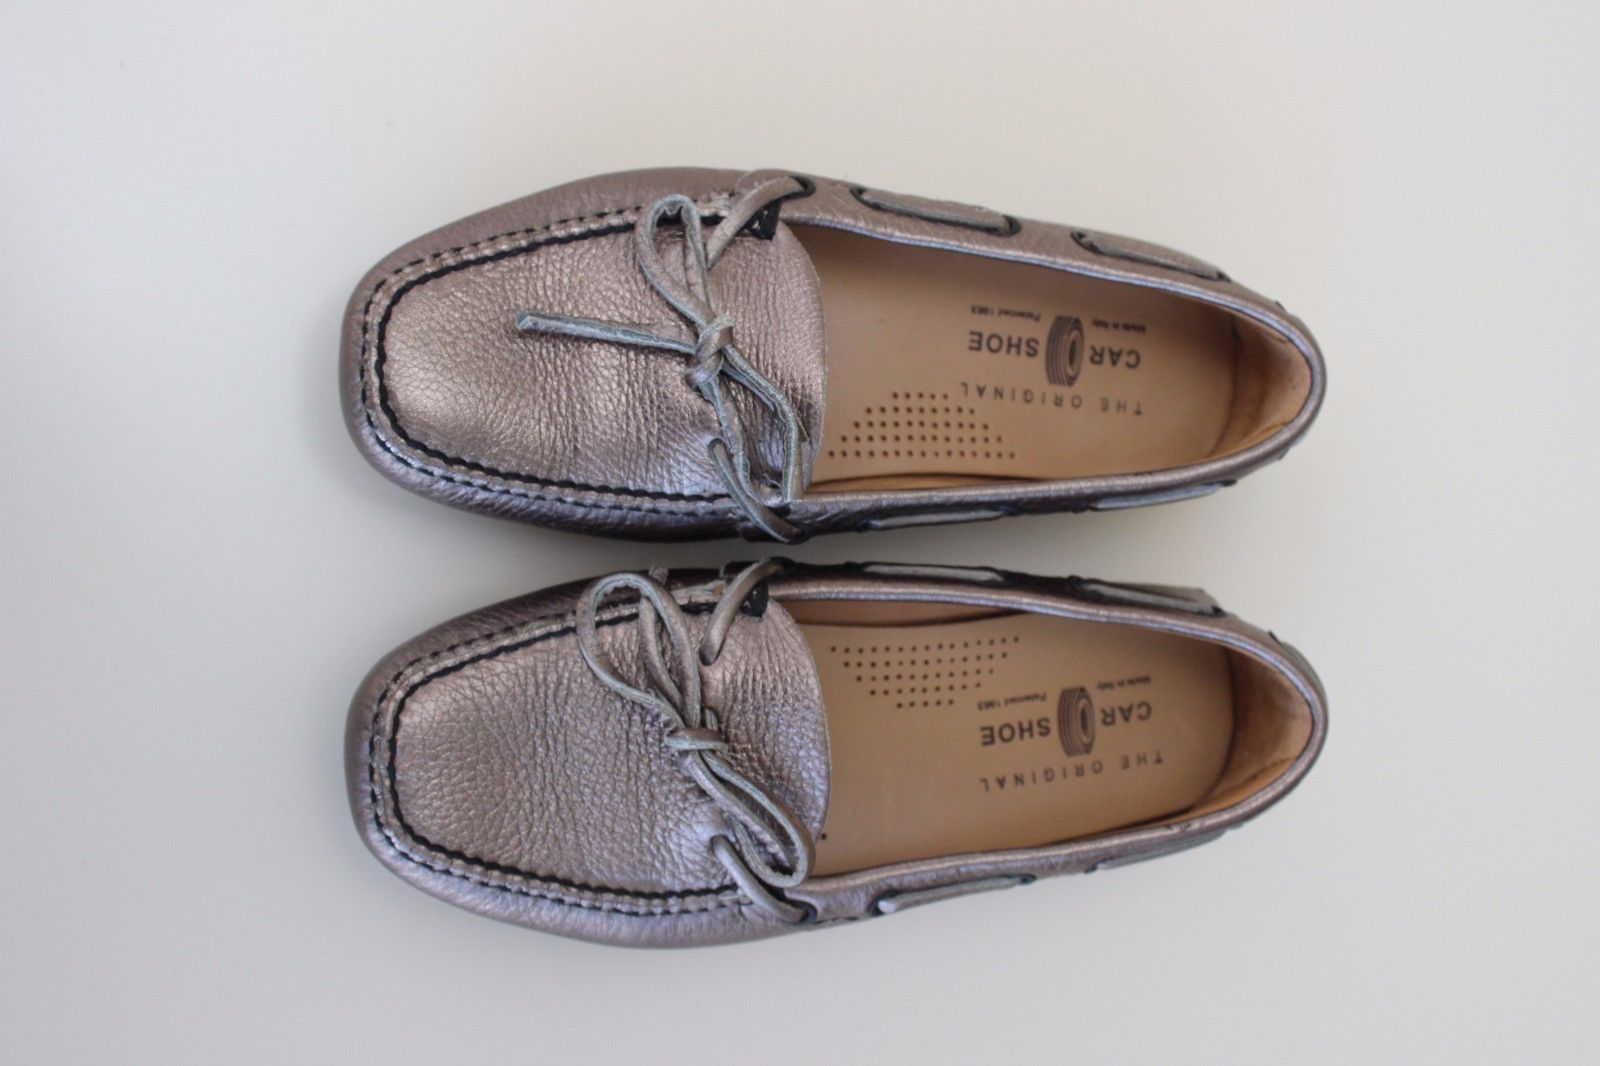 The Original Car Shoe PRADA Metallic Gold Bronze Loafer Shoes Women Sz 35 US 5